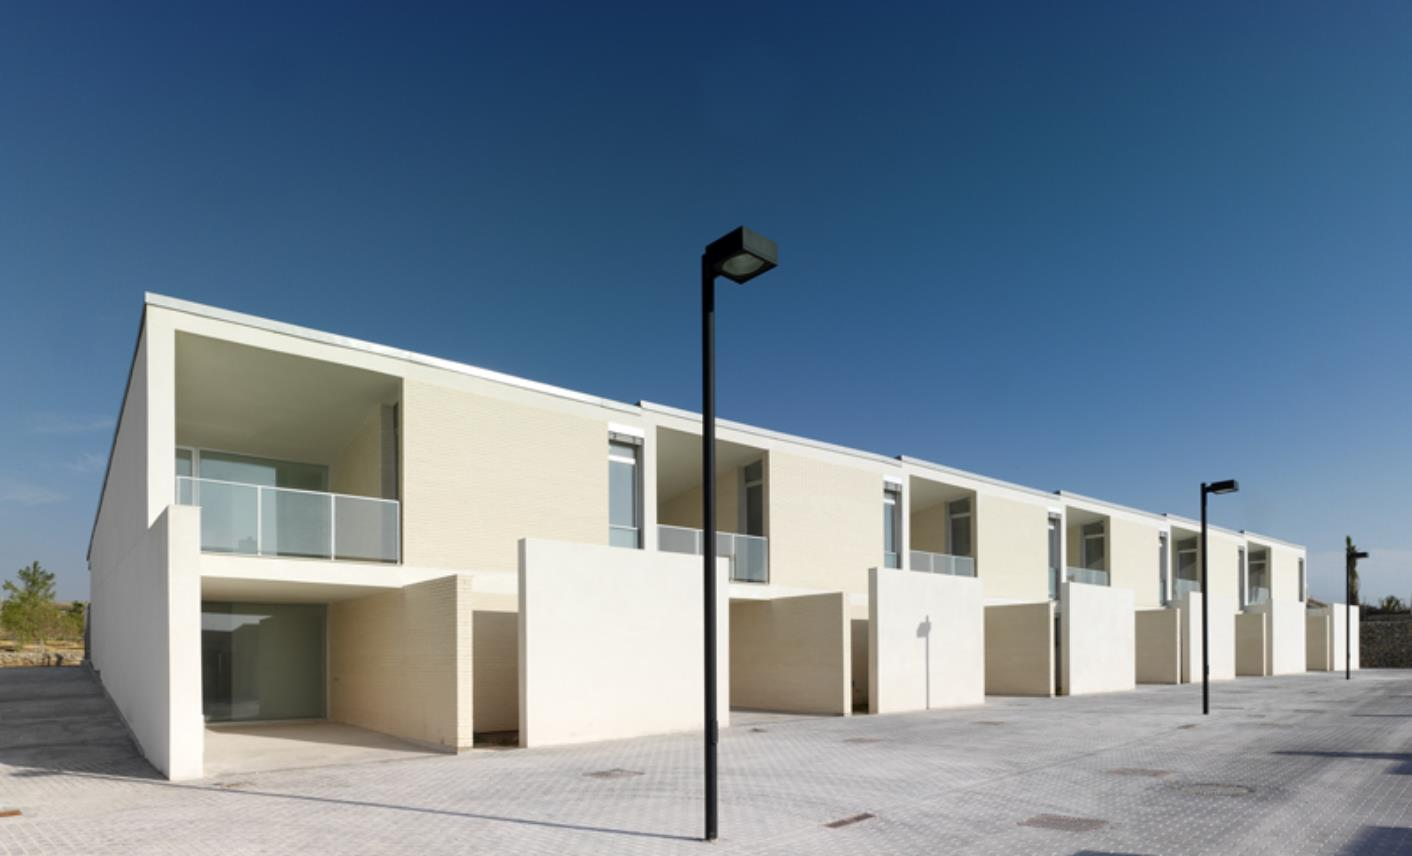 Residencial La Luz Arquitectura residencial Otxotorena arquitectos 01